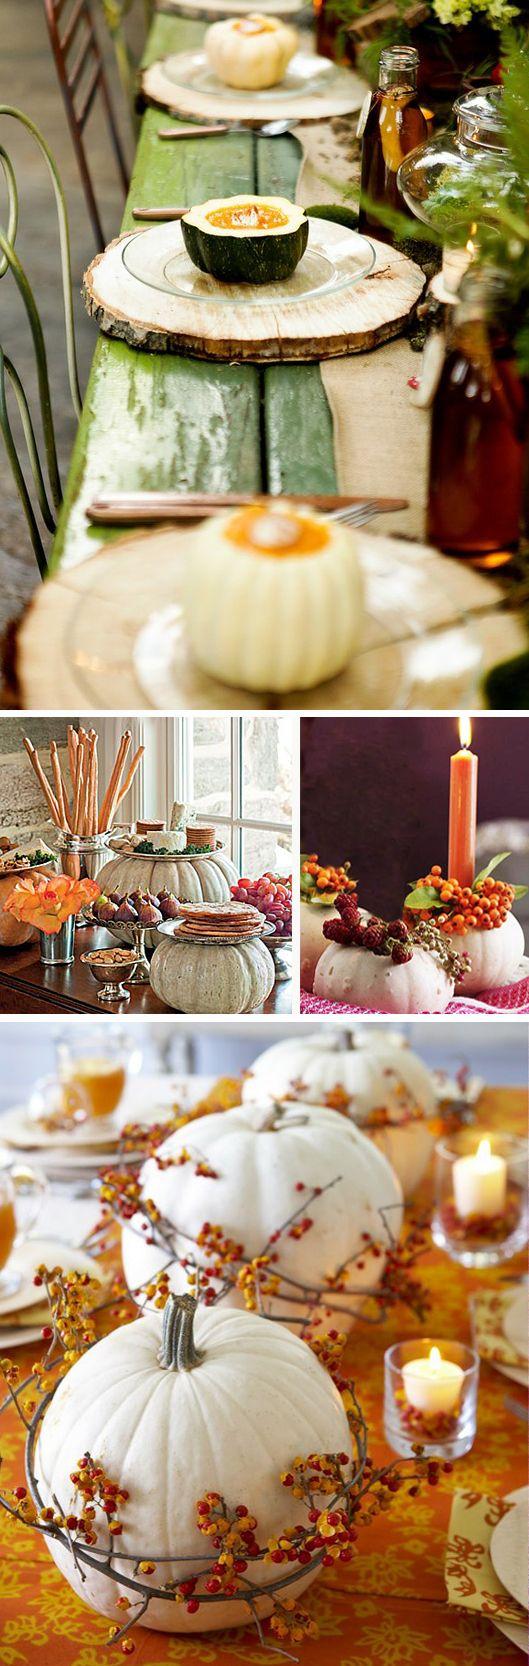 Fall wedding reception decor  White Pumpkins for Fall Wedding Décor  Reception Wedding and